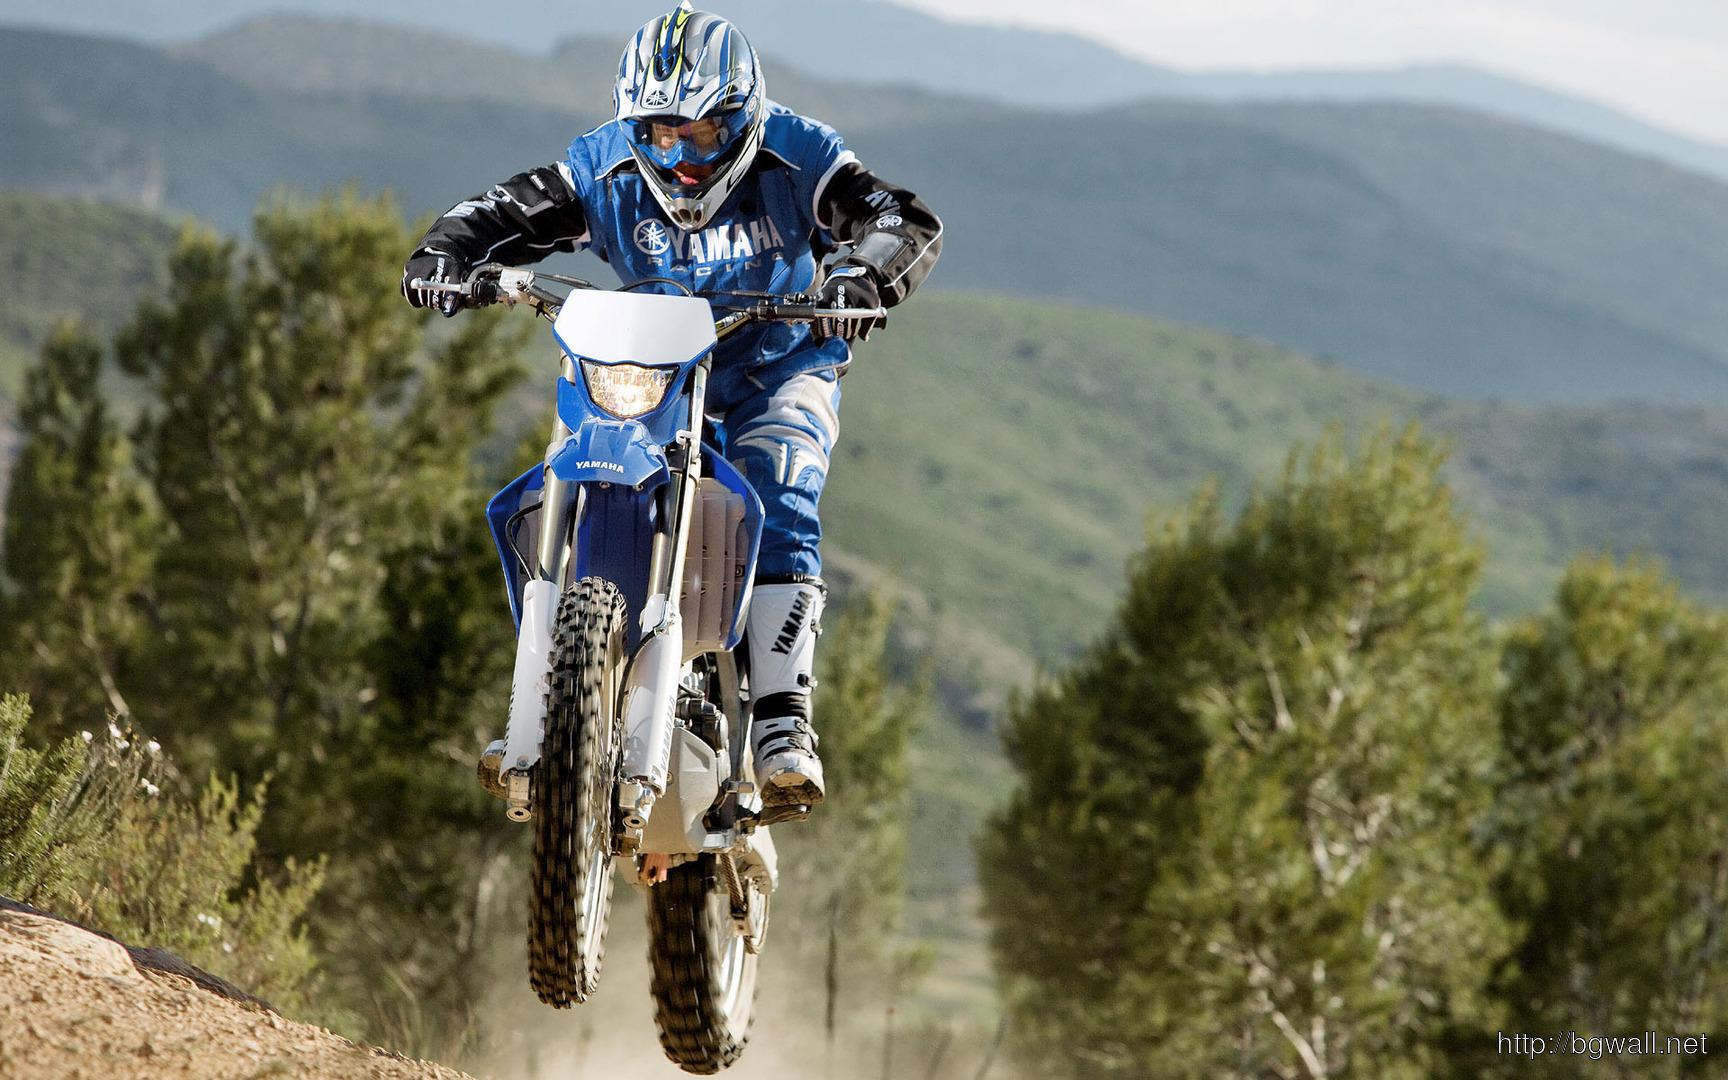 Download Yamaha Motocross Bike Wallpaper Full Size